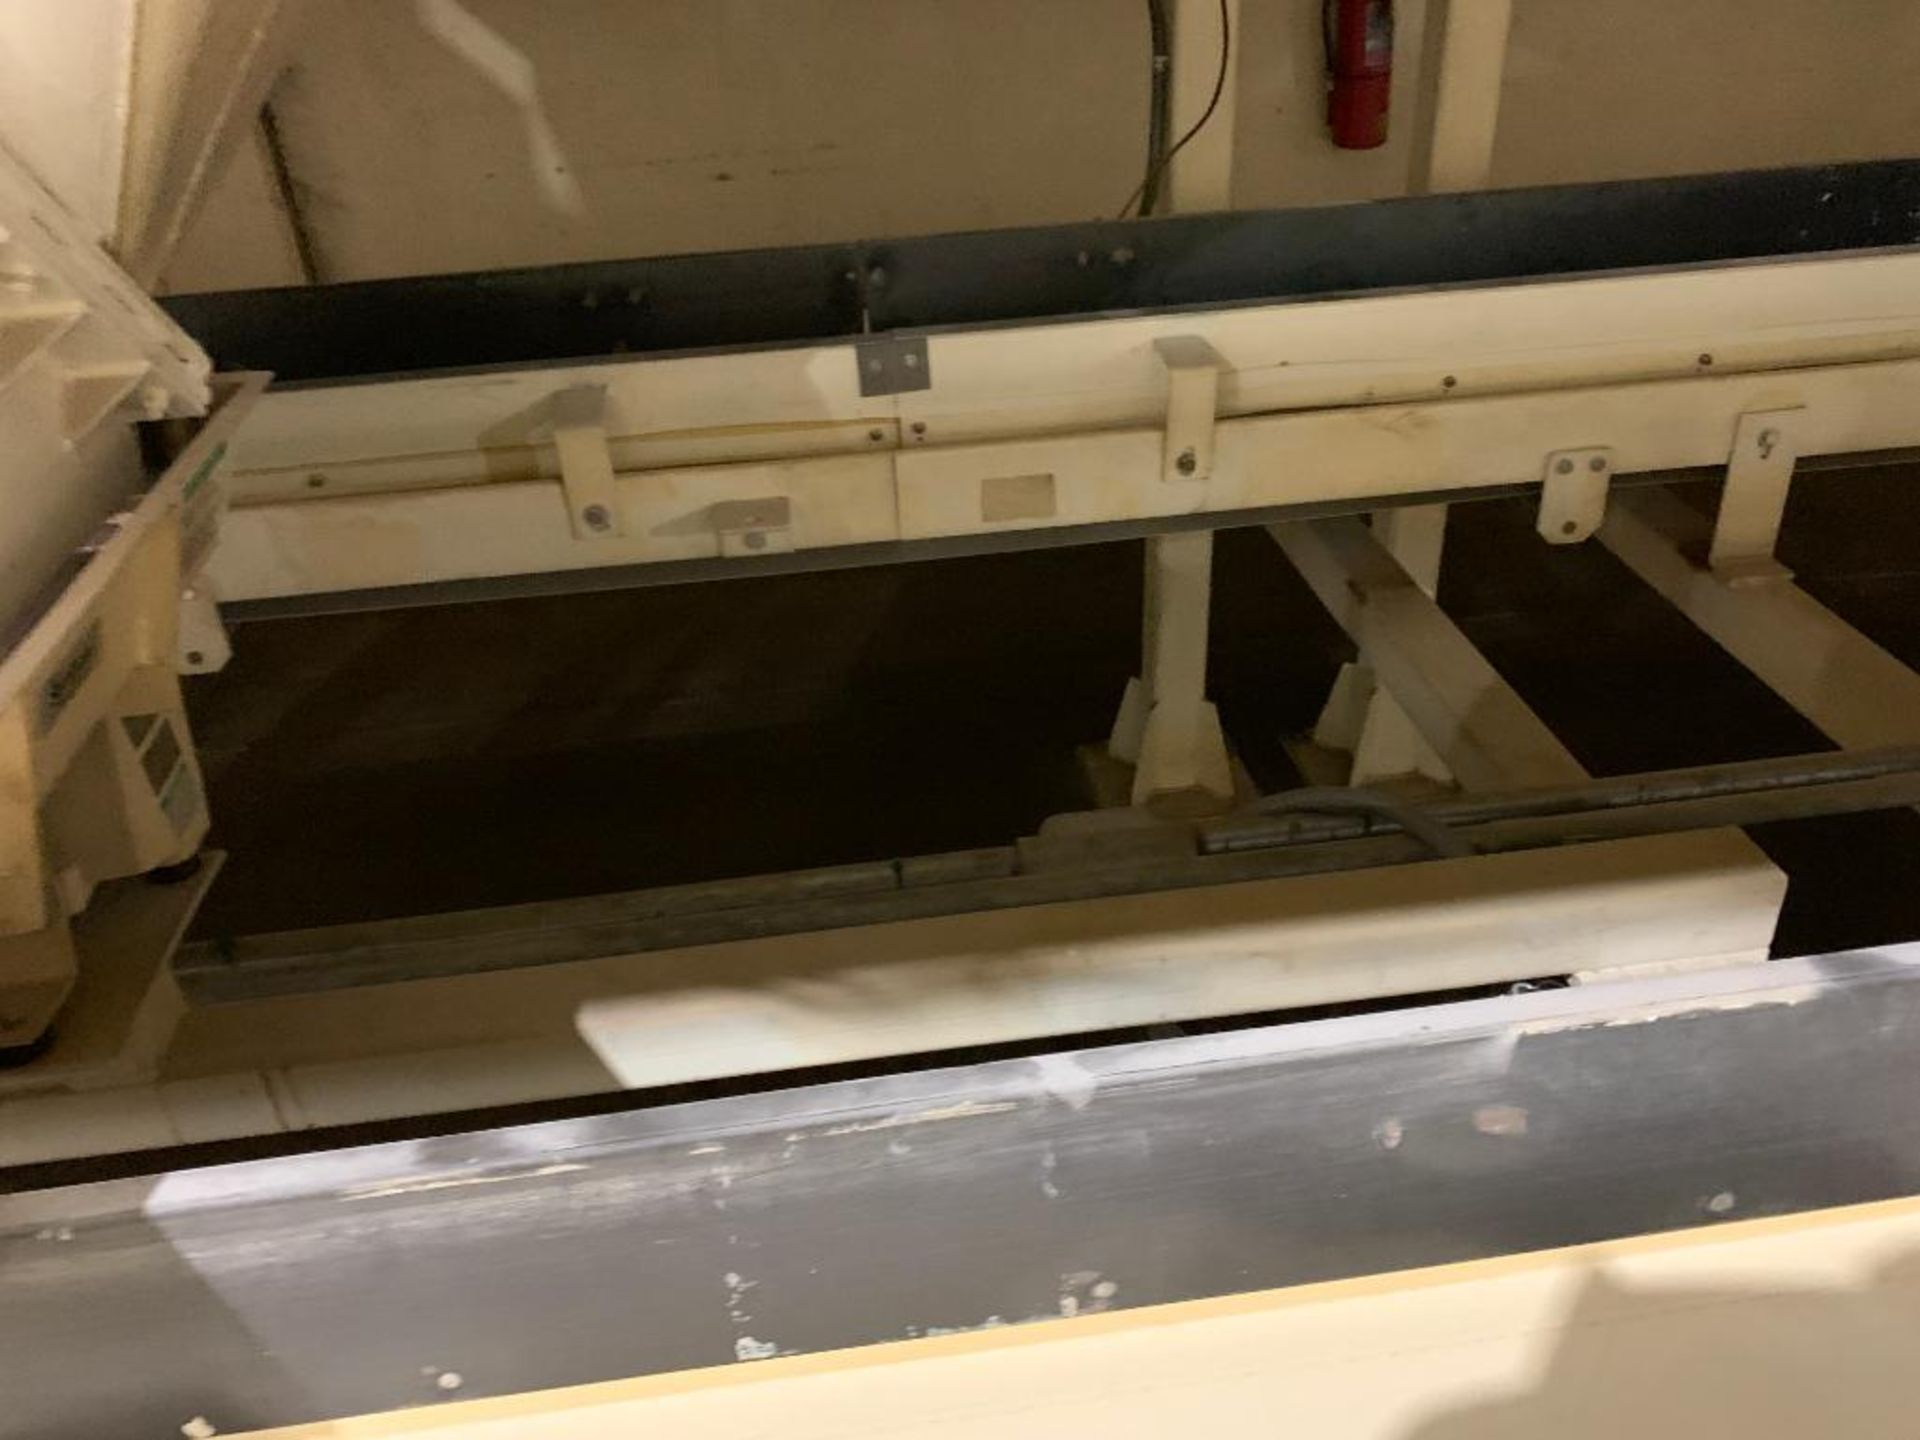 Aseeco mild steel cone bottom bulk storage bin - Image 8 of 22